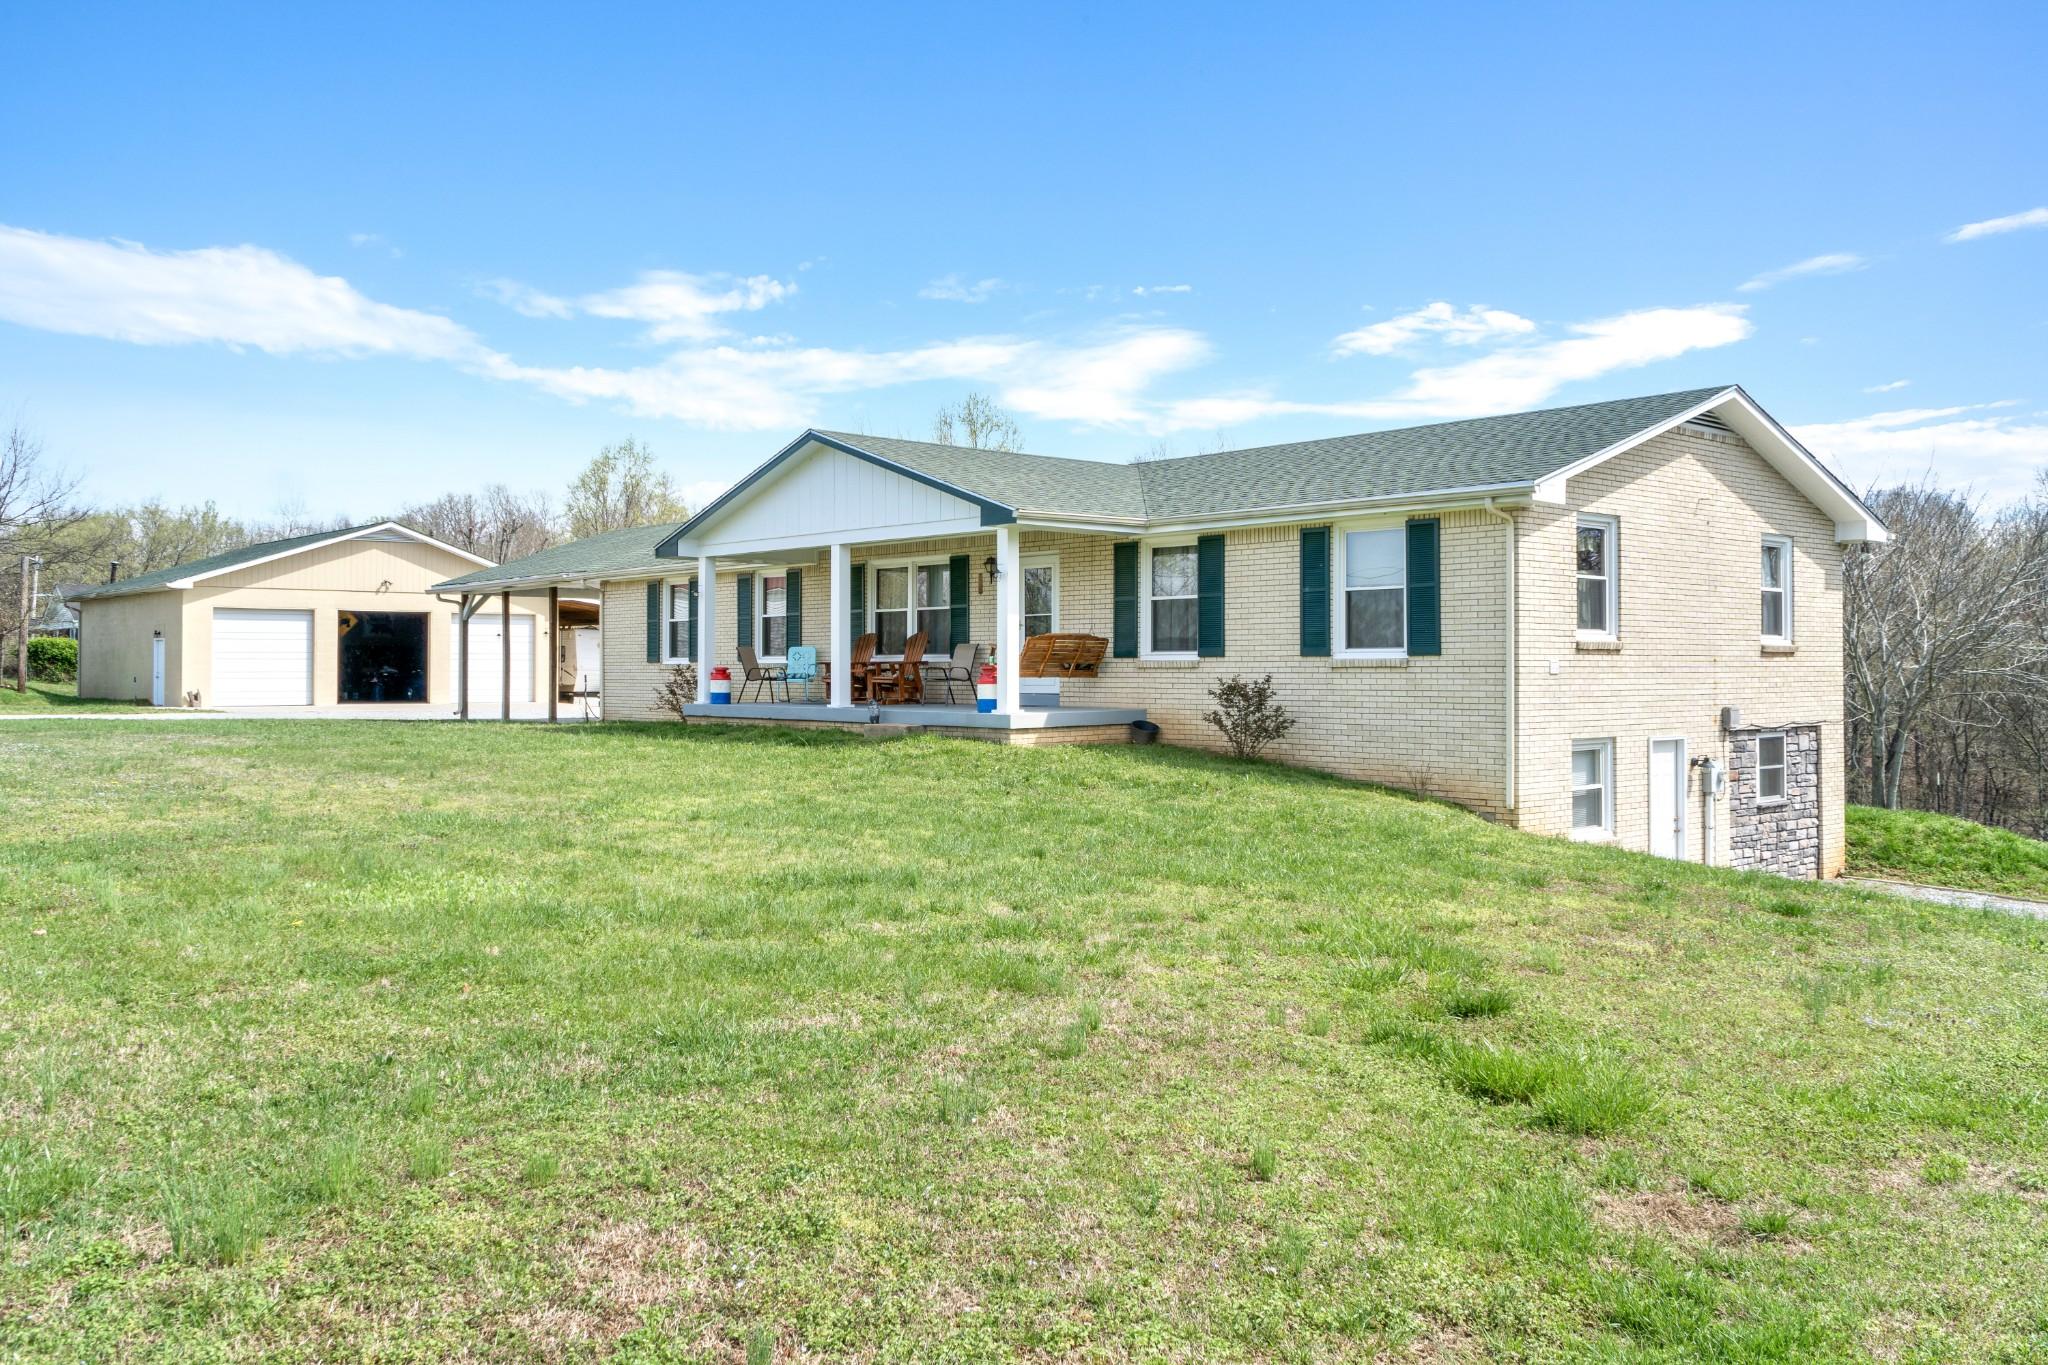 5955 Marion Rd, Cunningham, TN 37052 - Cunningham, TN real estate listing